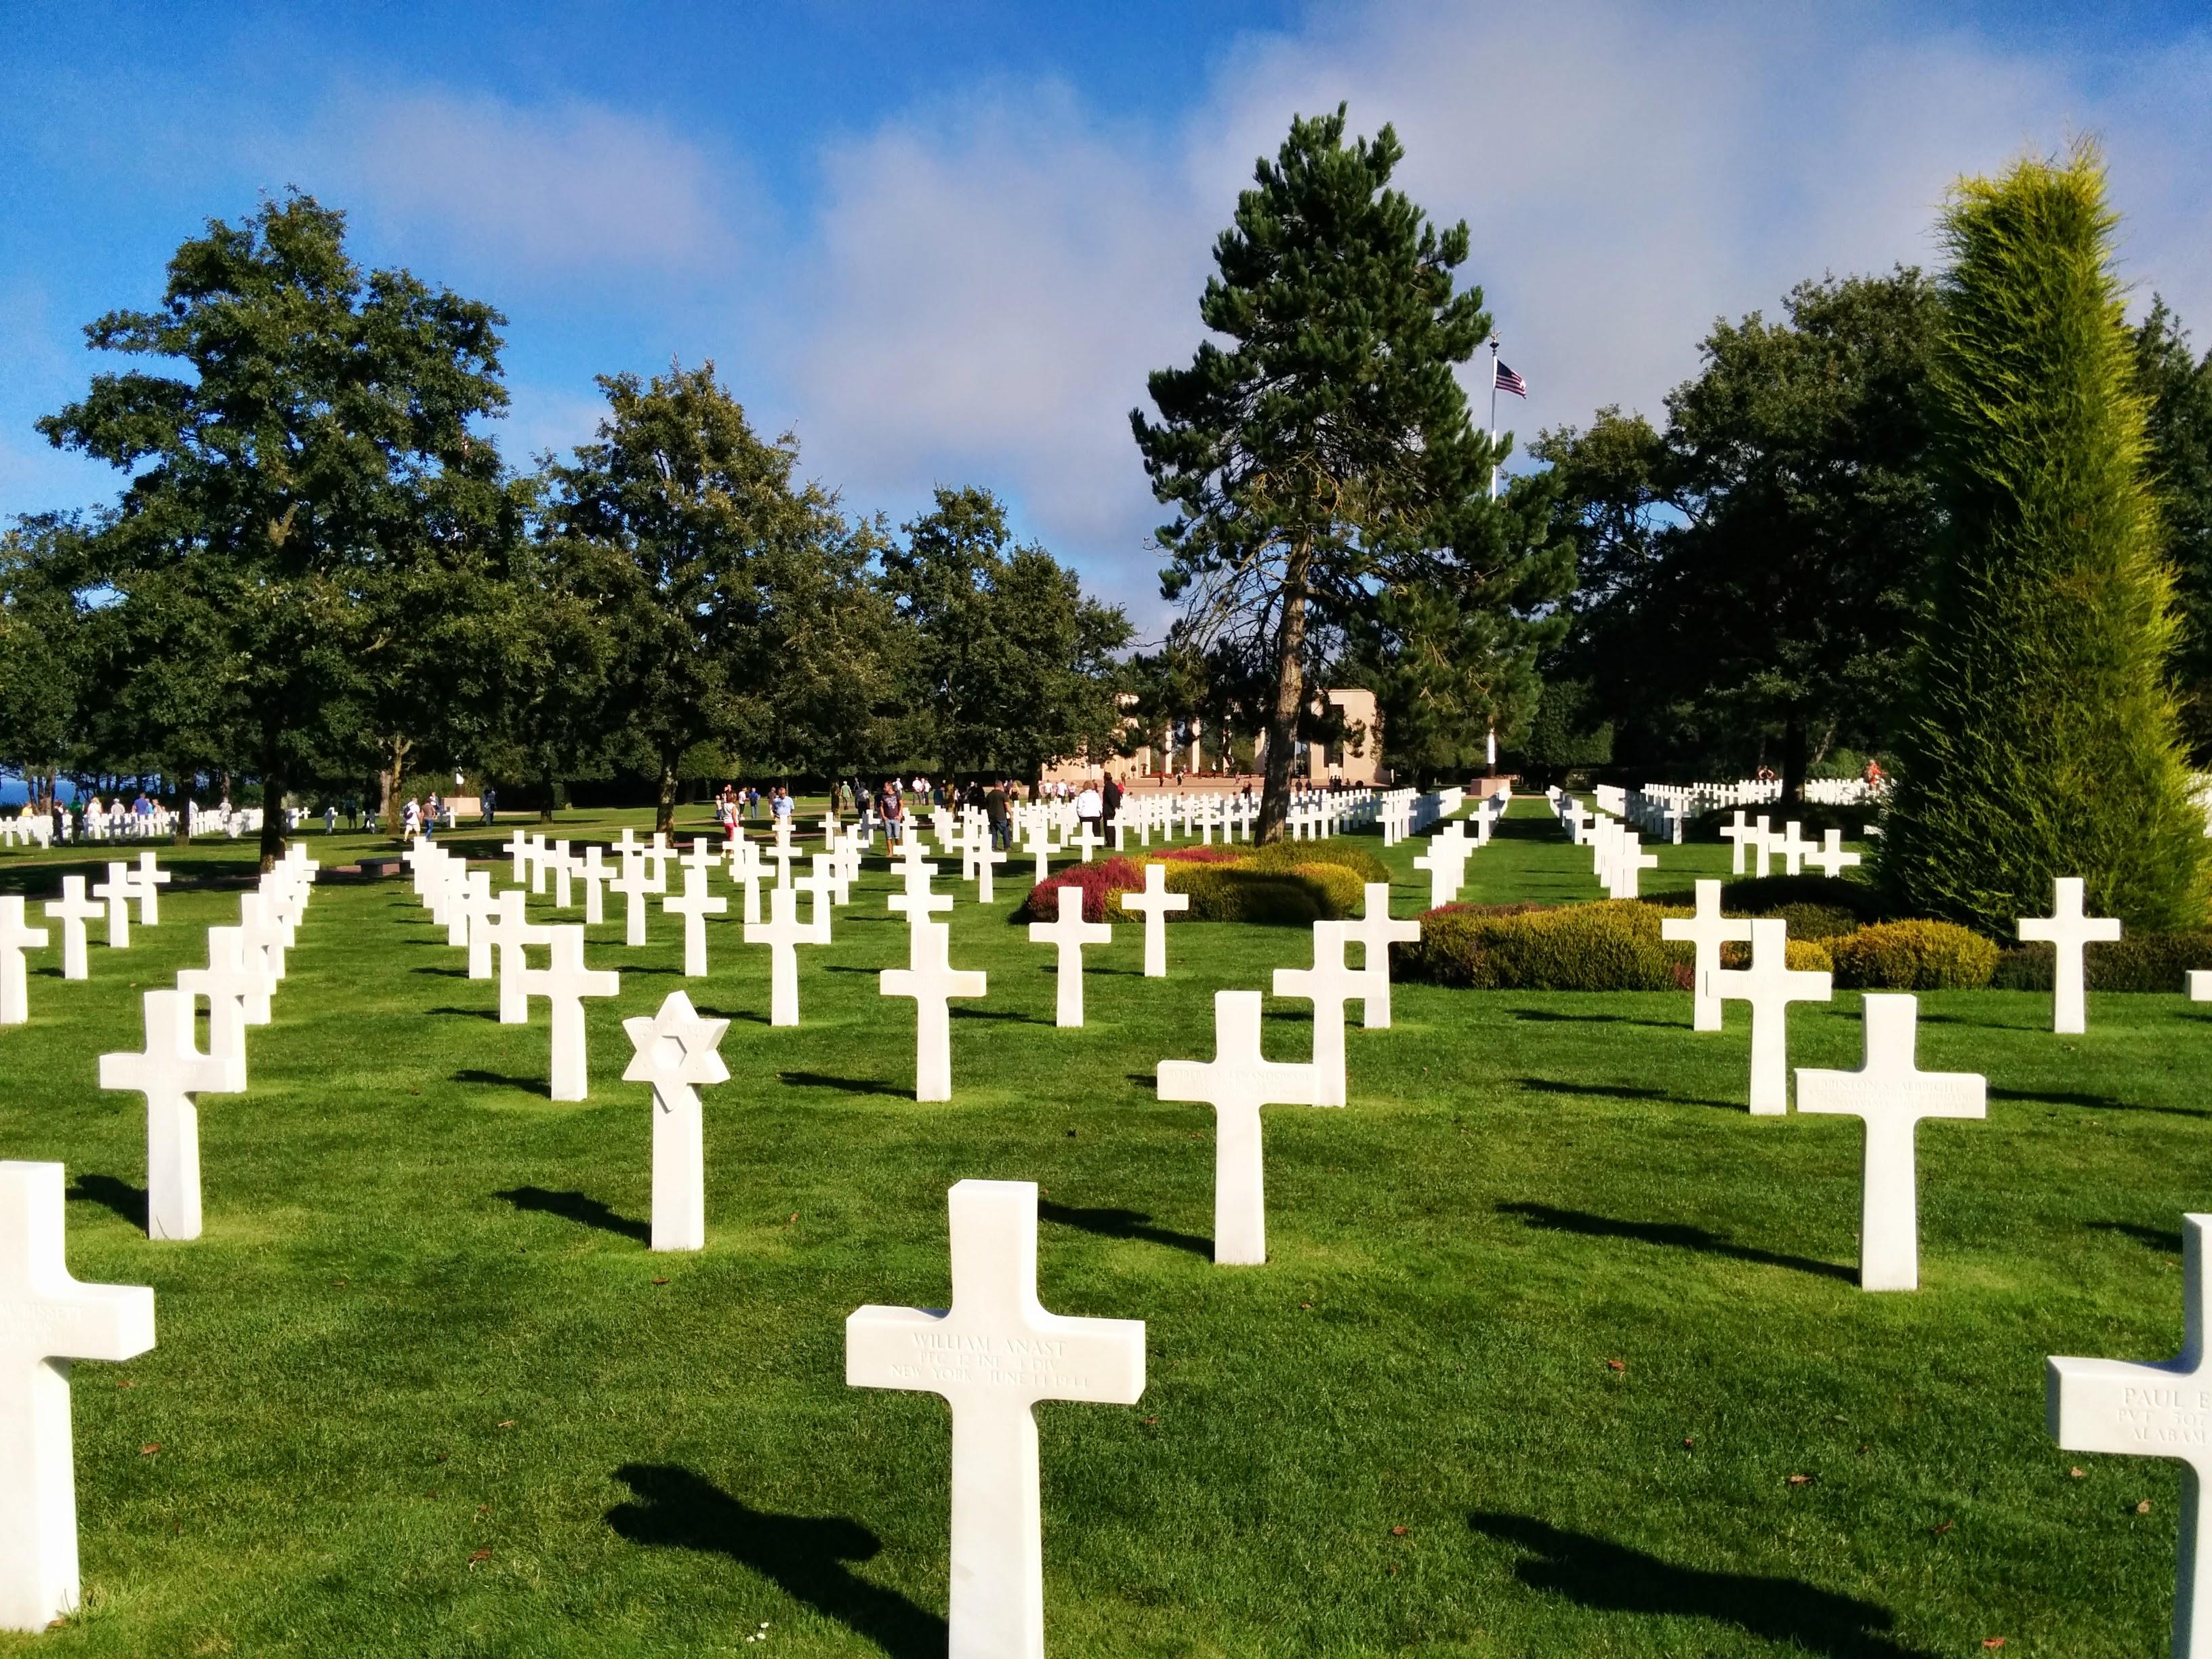 U.S. Military cemetery. Undernath, on the left, lies Omaha beach. Built past the bluffs of Omaha beach